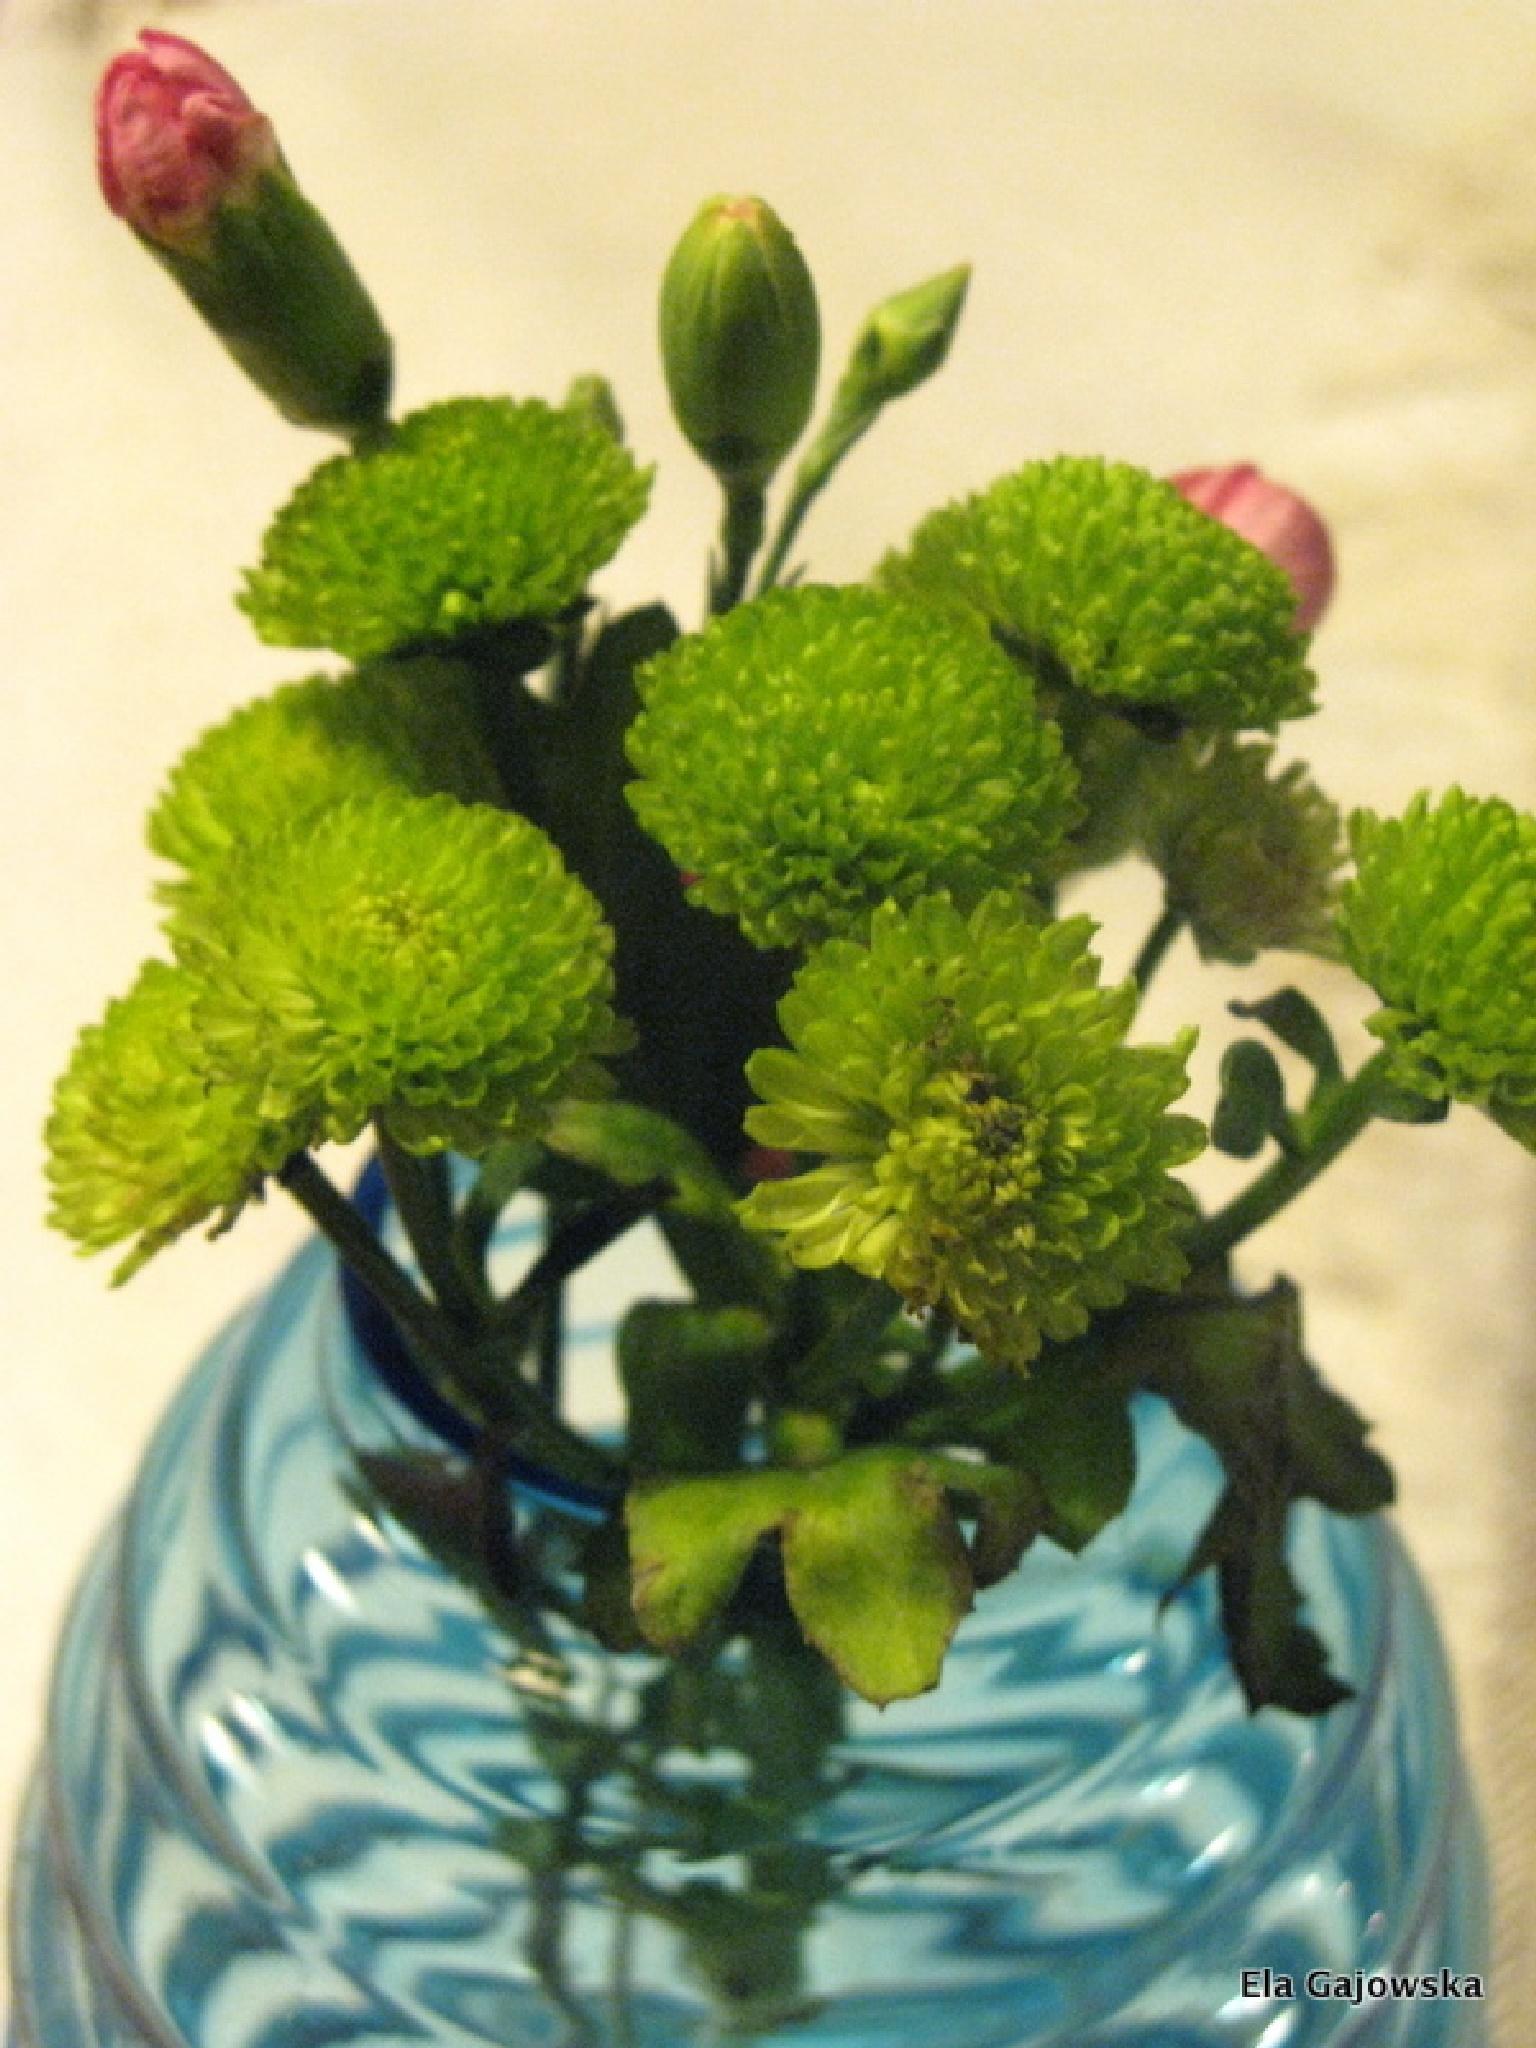 Flowers in a blue glass vase by Ela Gajowska